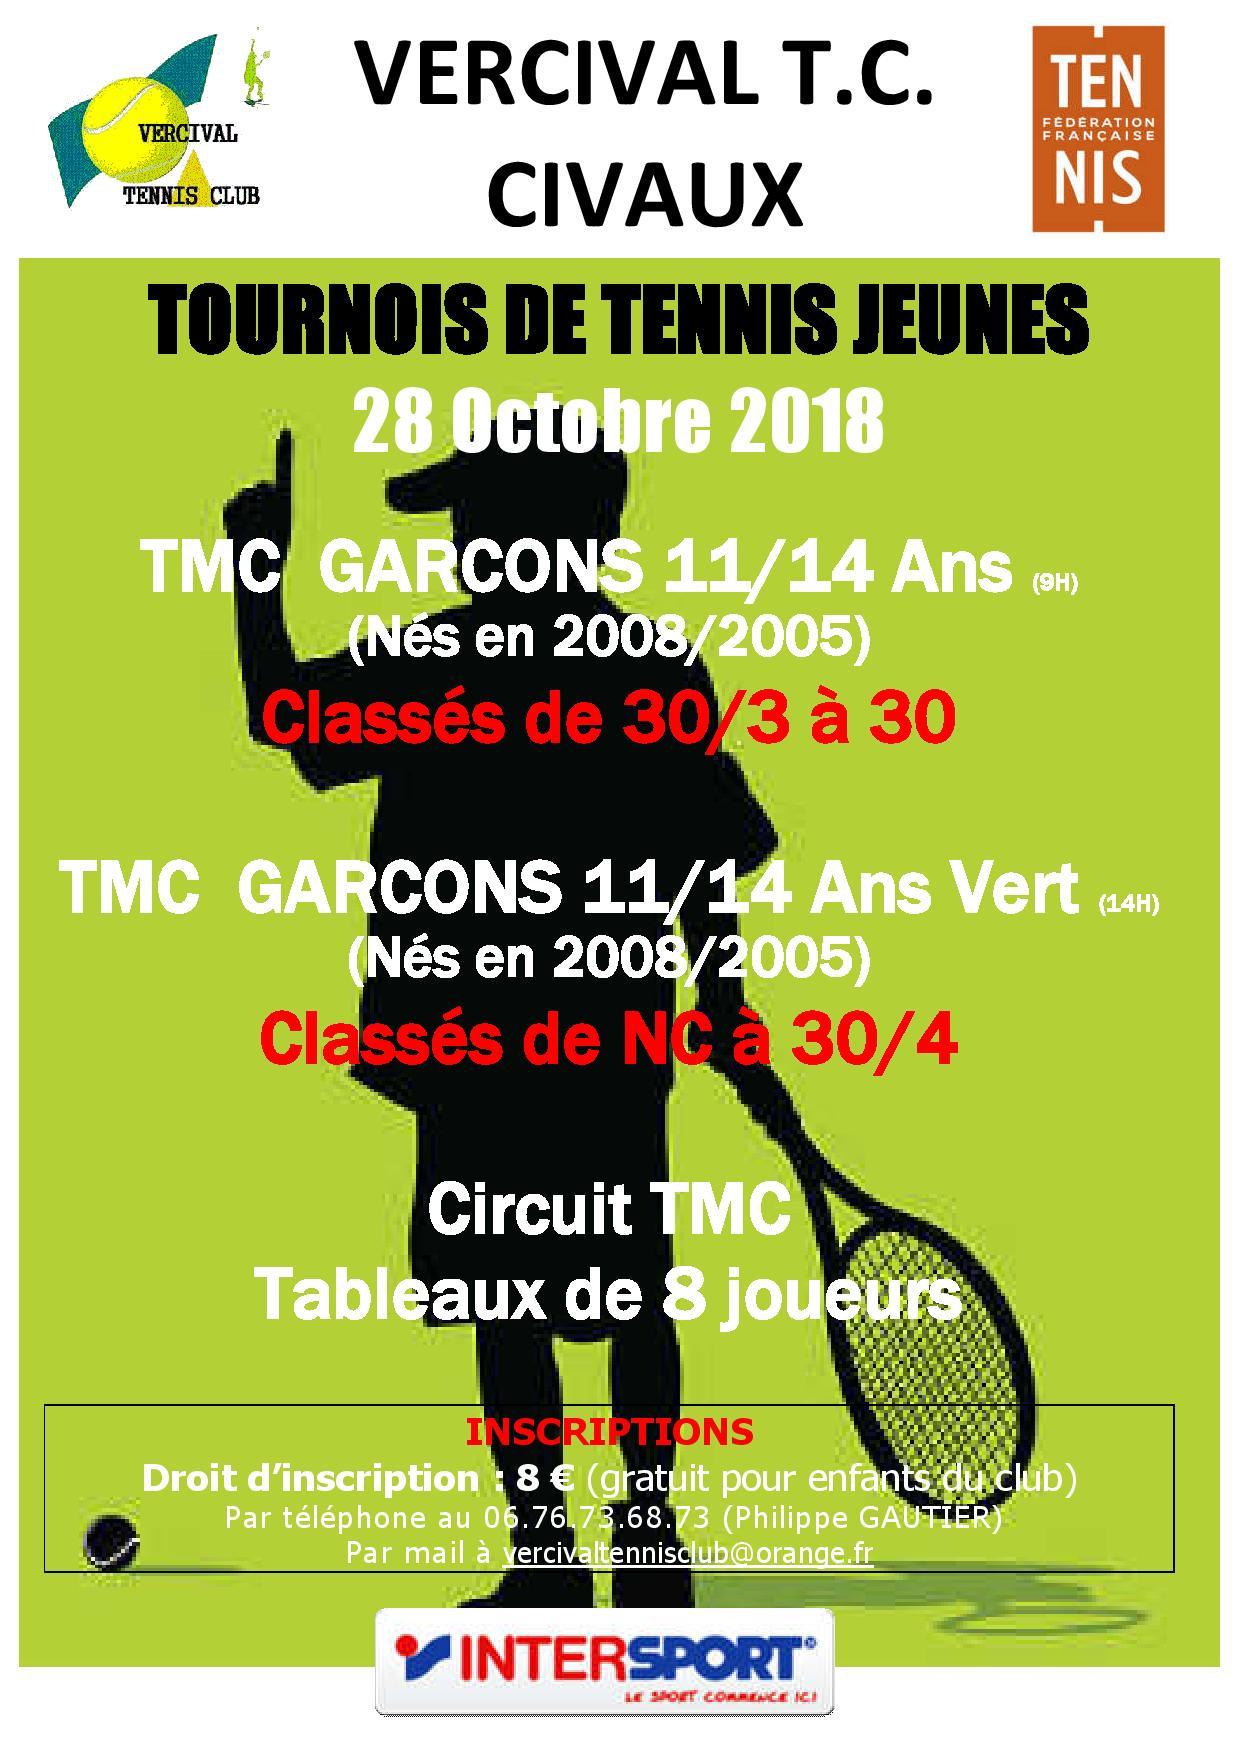 Calendrier Tmc Tennis 2021 Agenda   TMC 11 14 ans G de 30/3 à 30   club Tennis VERCIVAL